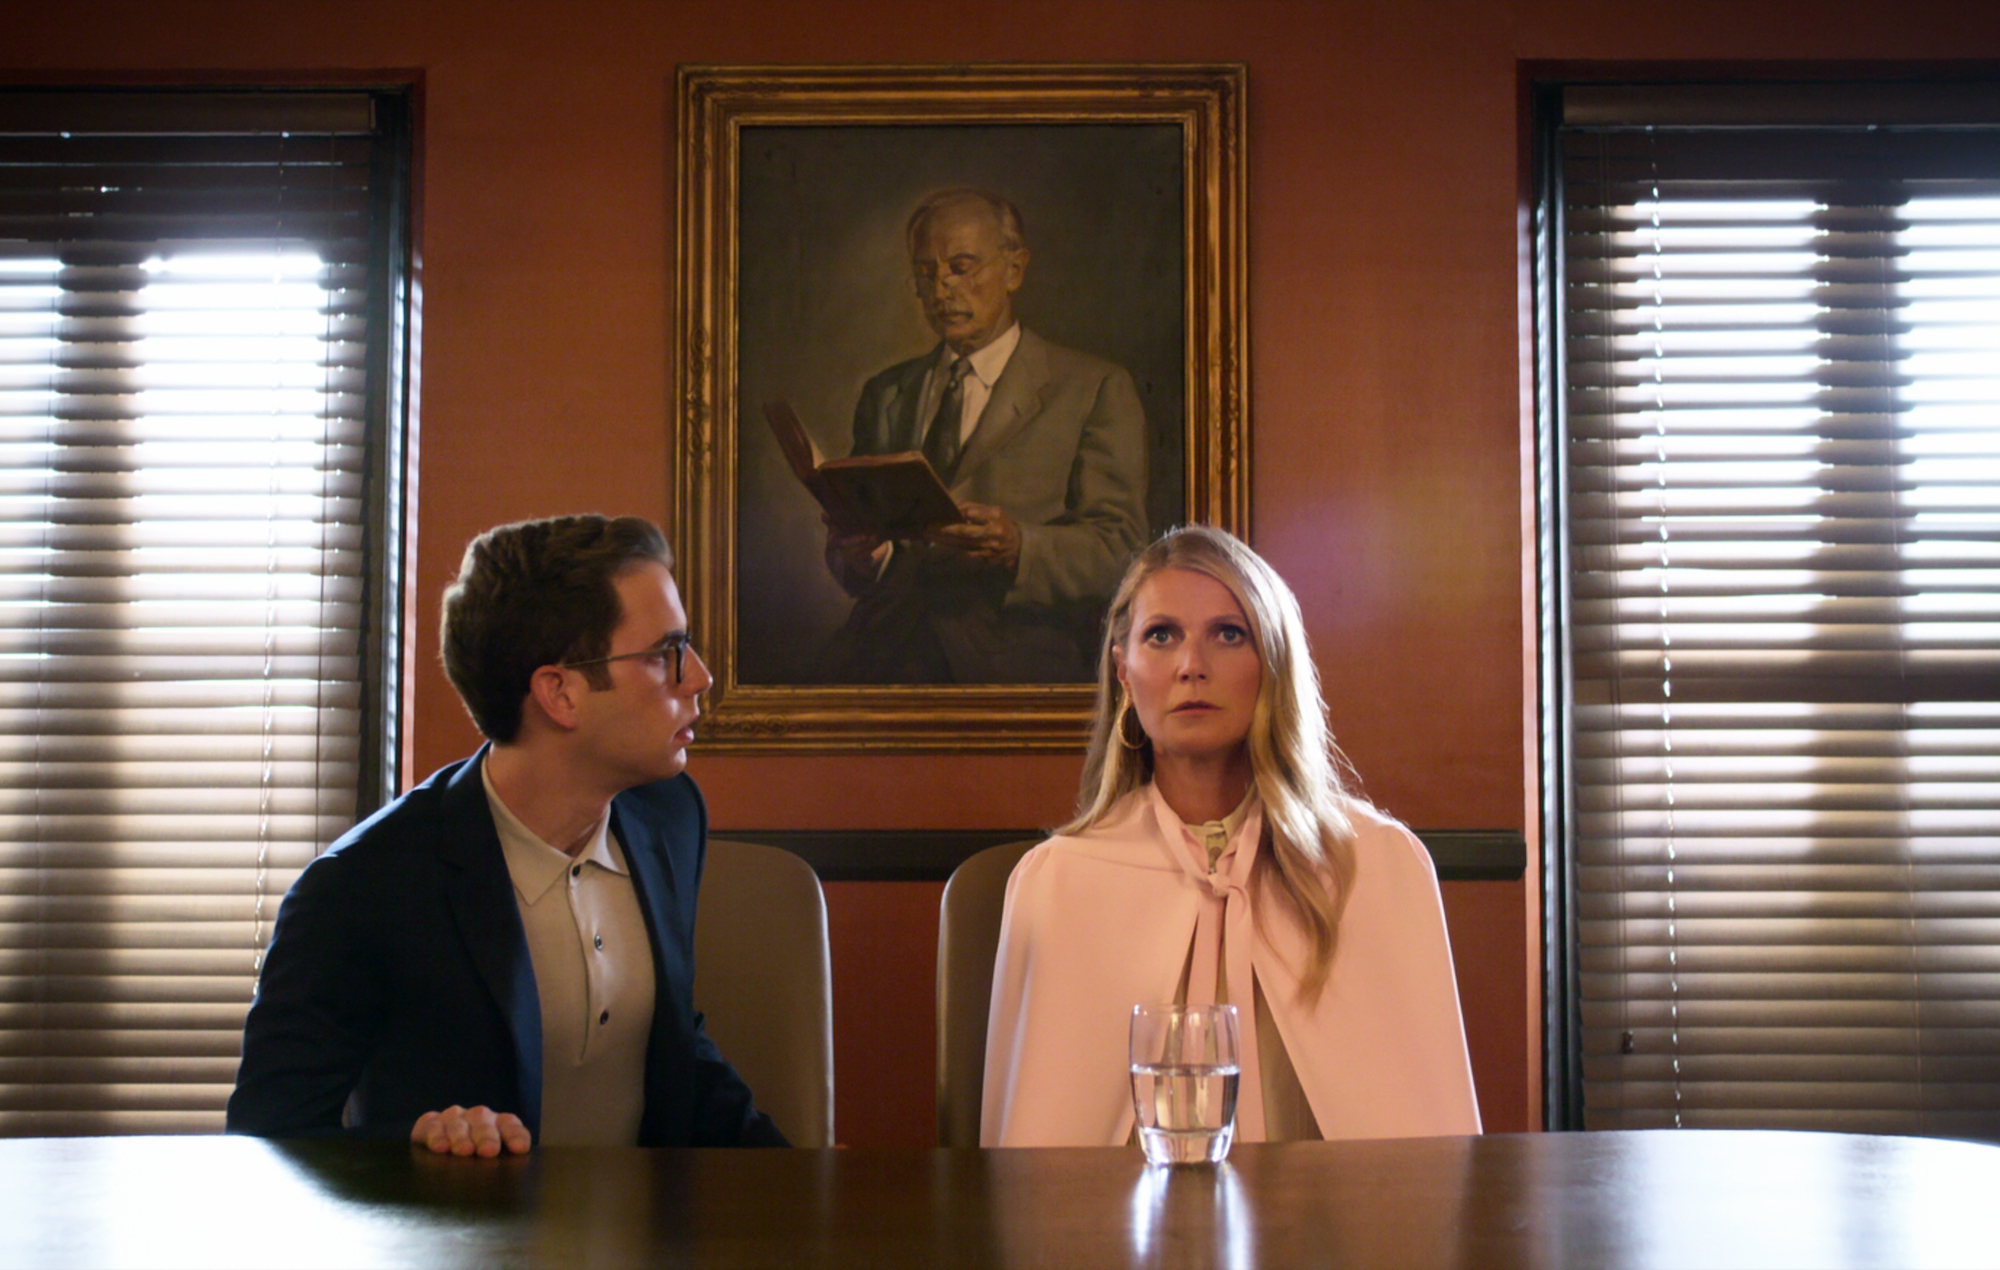 Ben Platt and Gwyneth Paltrow star in Netflix's The Politician